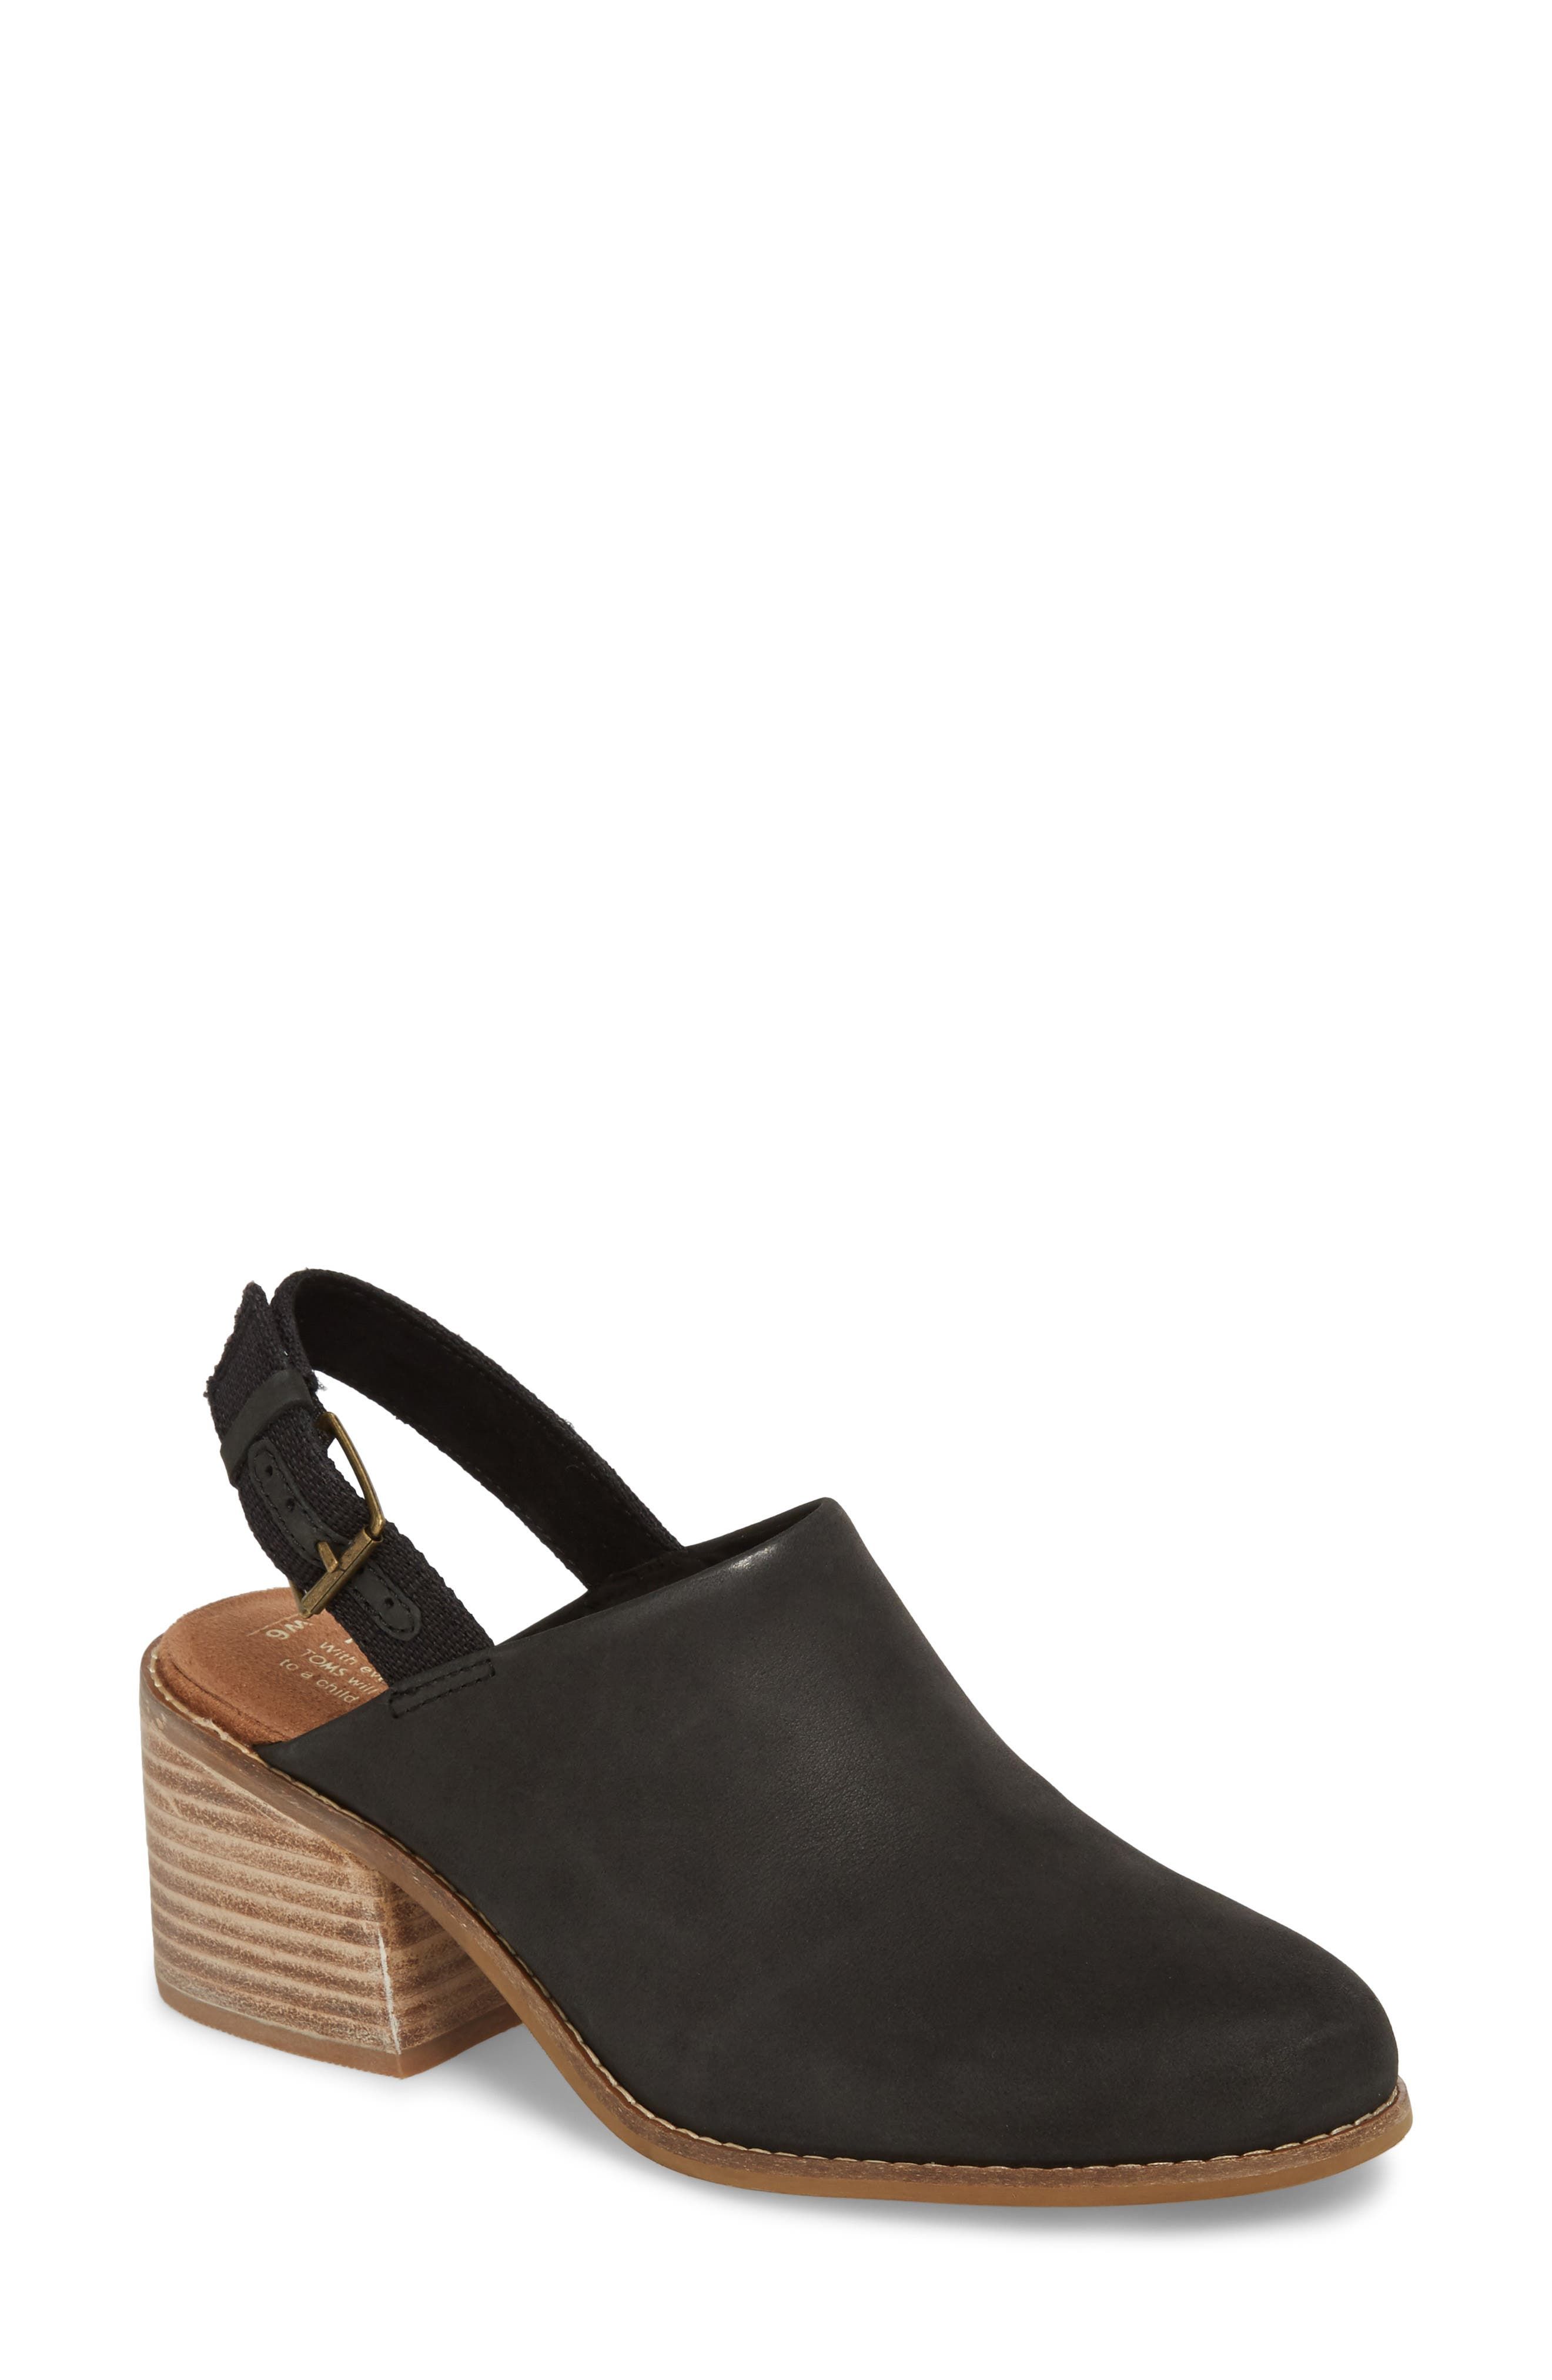 Leila Slingback Sandal,                         Main,                         color, Black Leather